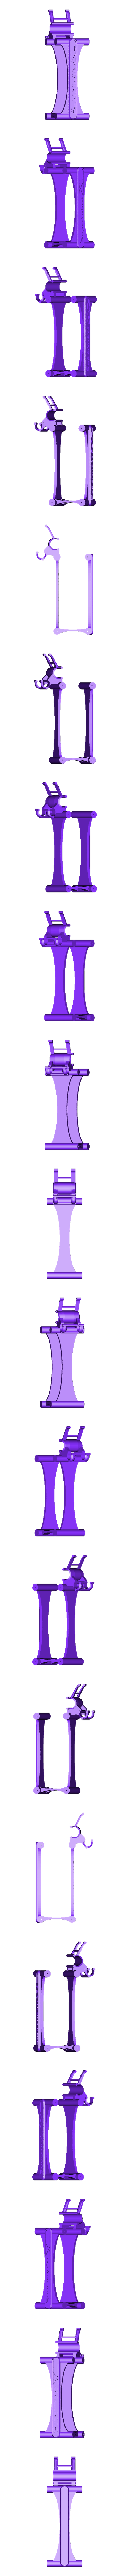 lipo_tray.stl Download free STL file FPV kit for Turnigy 9XR • 3D print model, 3dxl